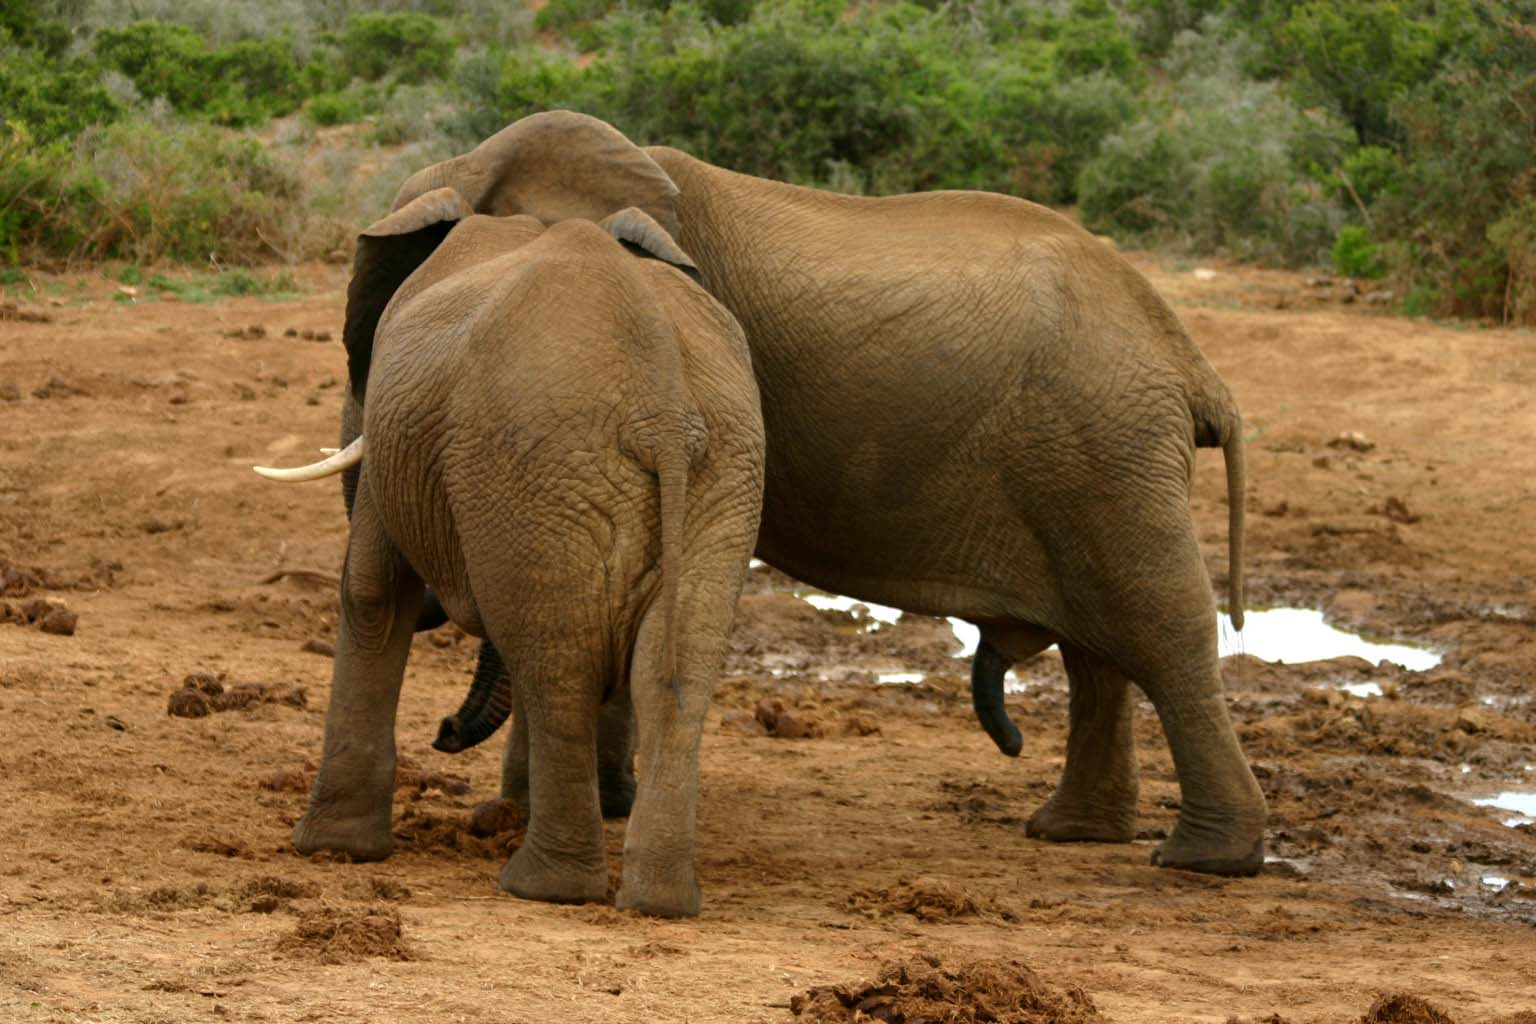 Description Elephant mating ritual 5.jpg: commons.wikimedia.org/wiki/File:Elephant_mating_ritual_5.jpg